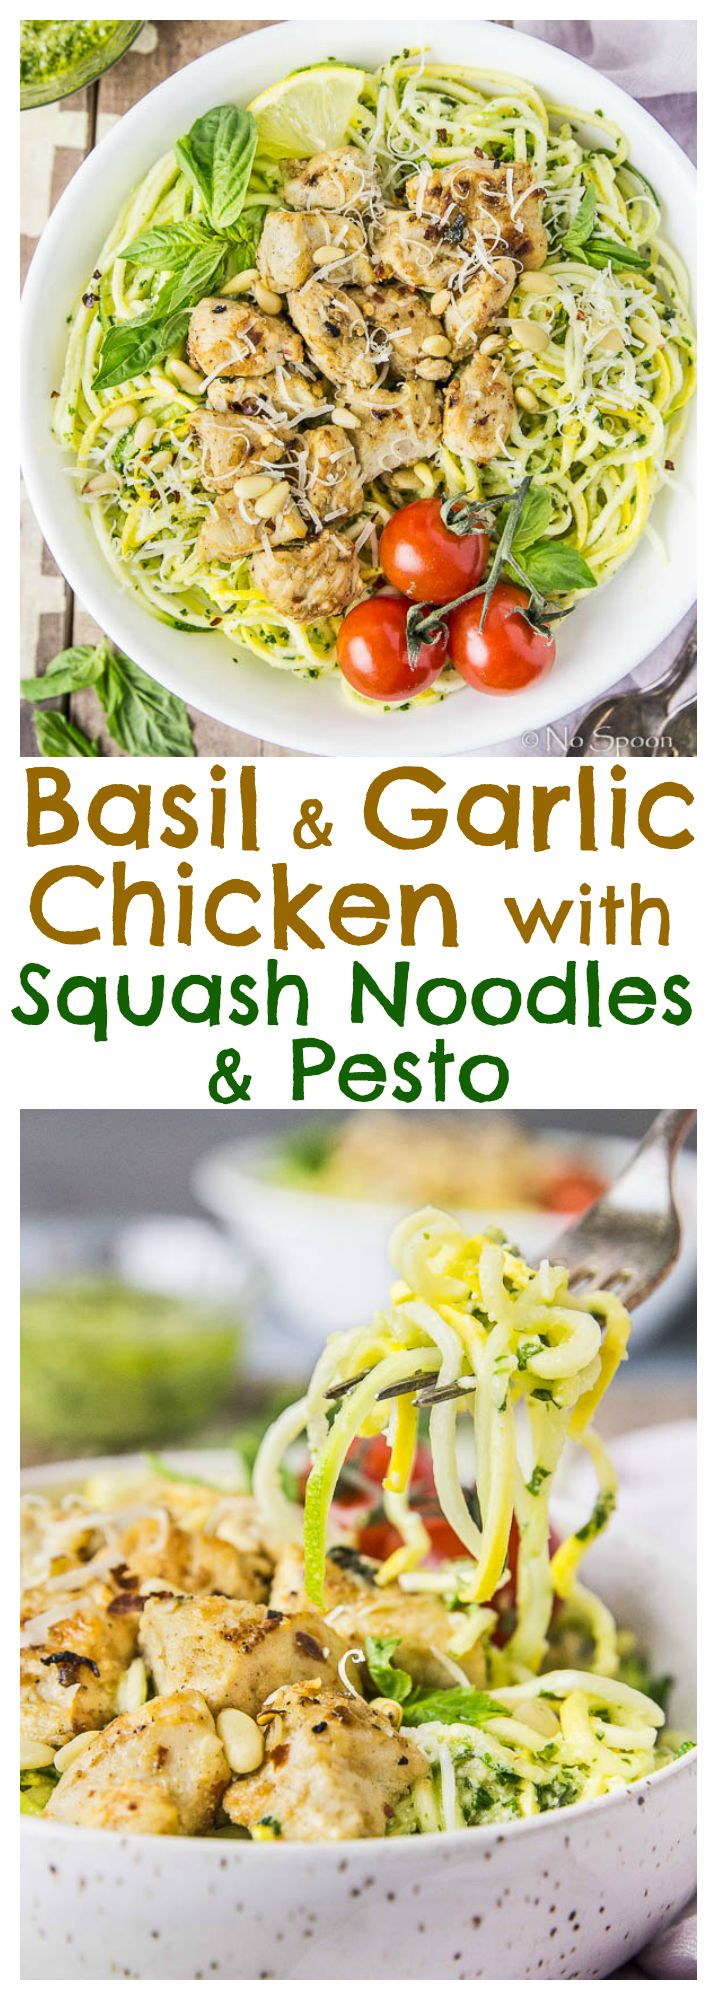 Basil Garlic Chicken Stir Fry with Squash Noodles & Pesto